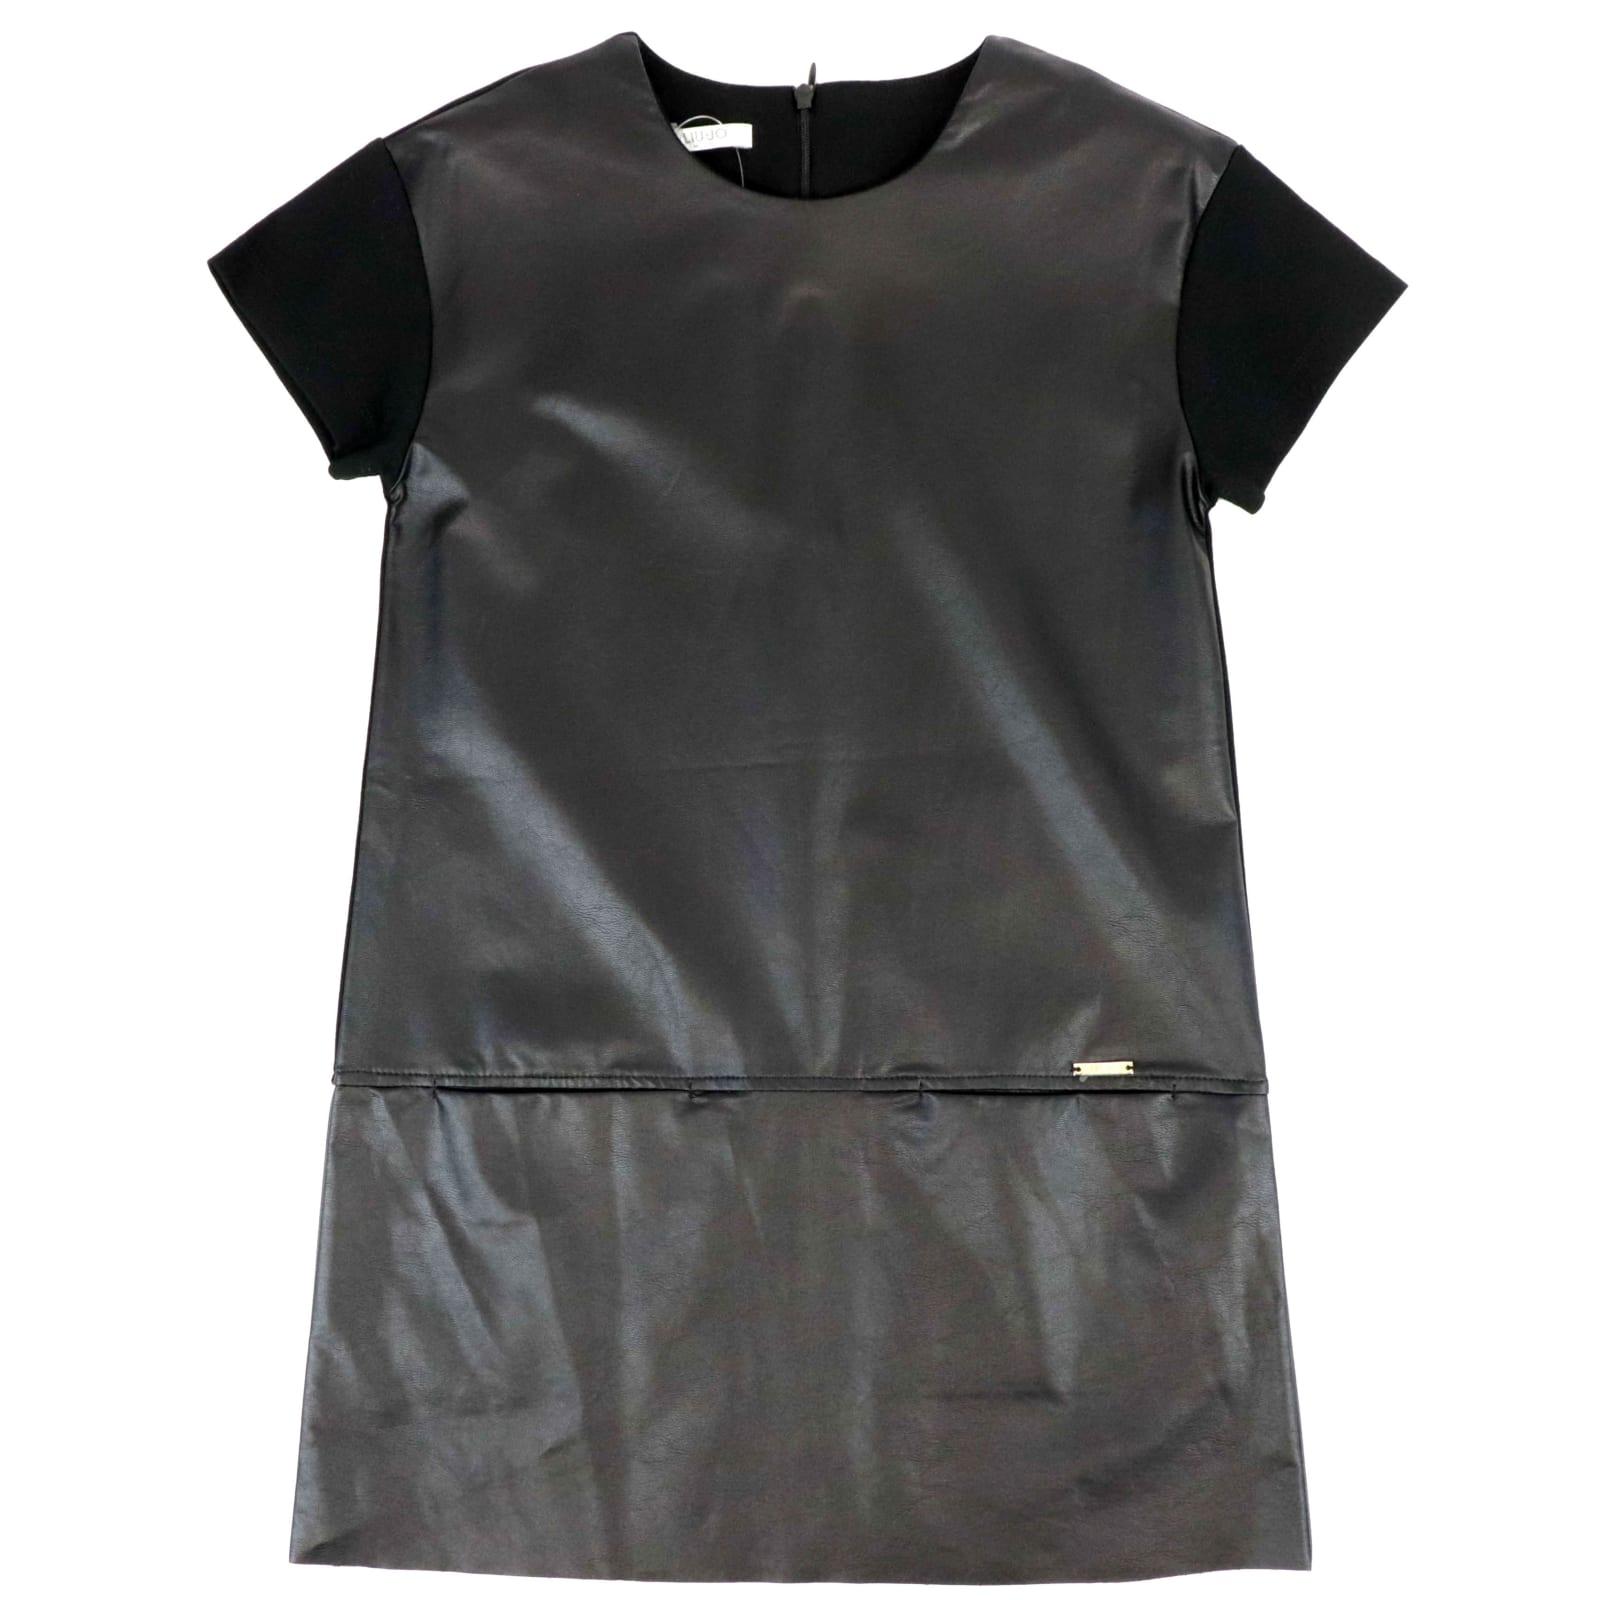 Liu •jo Kids' Dress Dress In Black